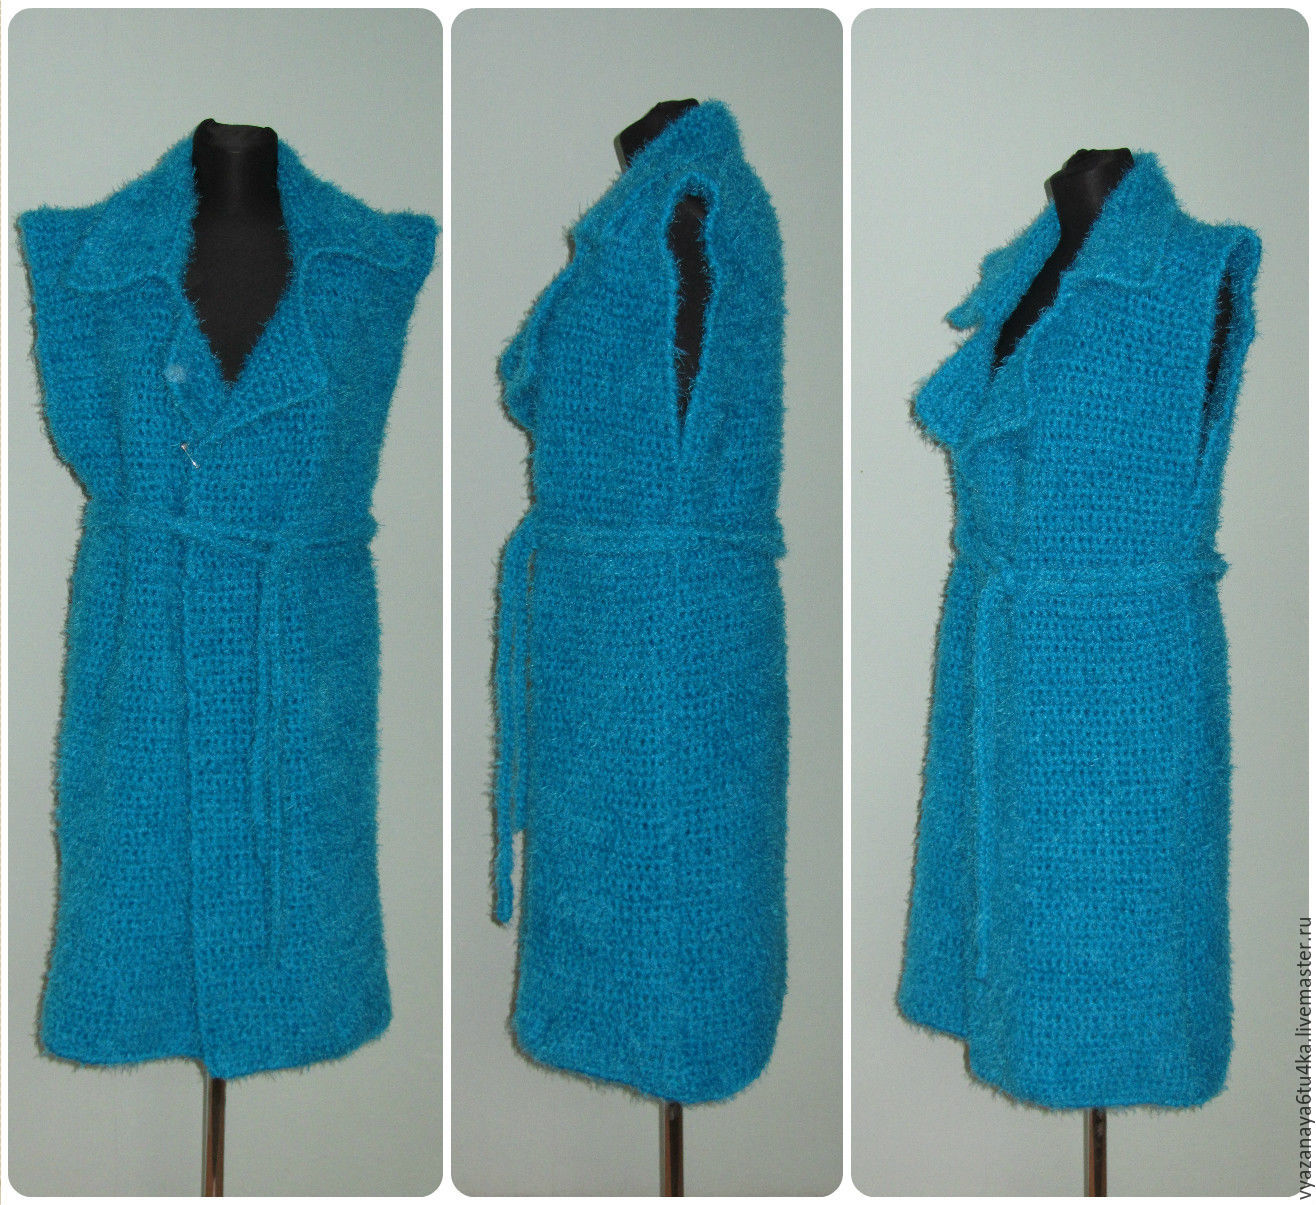 Turquoise knit coat ' Birusinka ', Coats, Moscow,  Фото №1